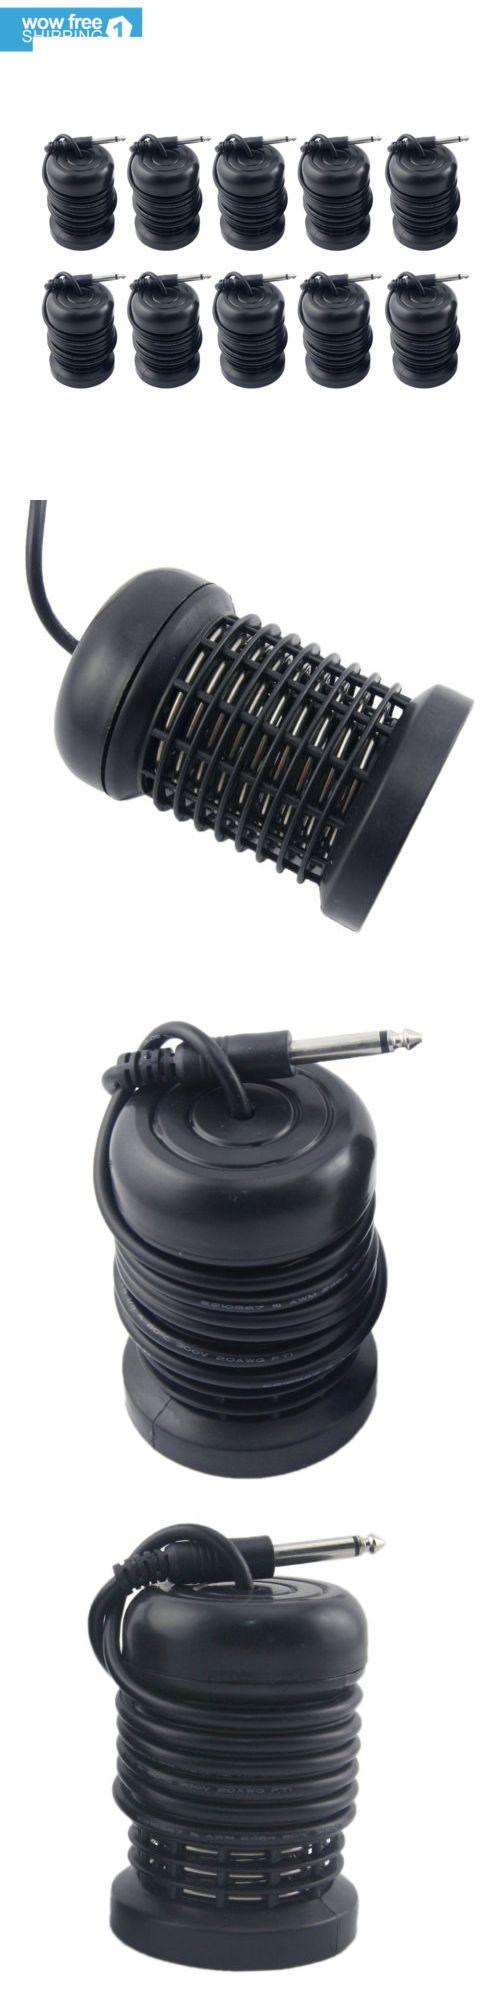 Ion Foot Baths: 10Pcs Array Arrays For Ionic Ion Aqua Detox Cleanse Machine Foot Spa Bath -> BUY IT NOW ONLY: $39.88 on eBay!